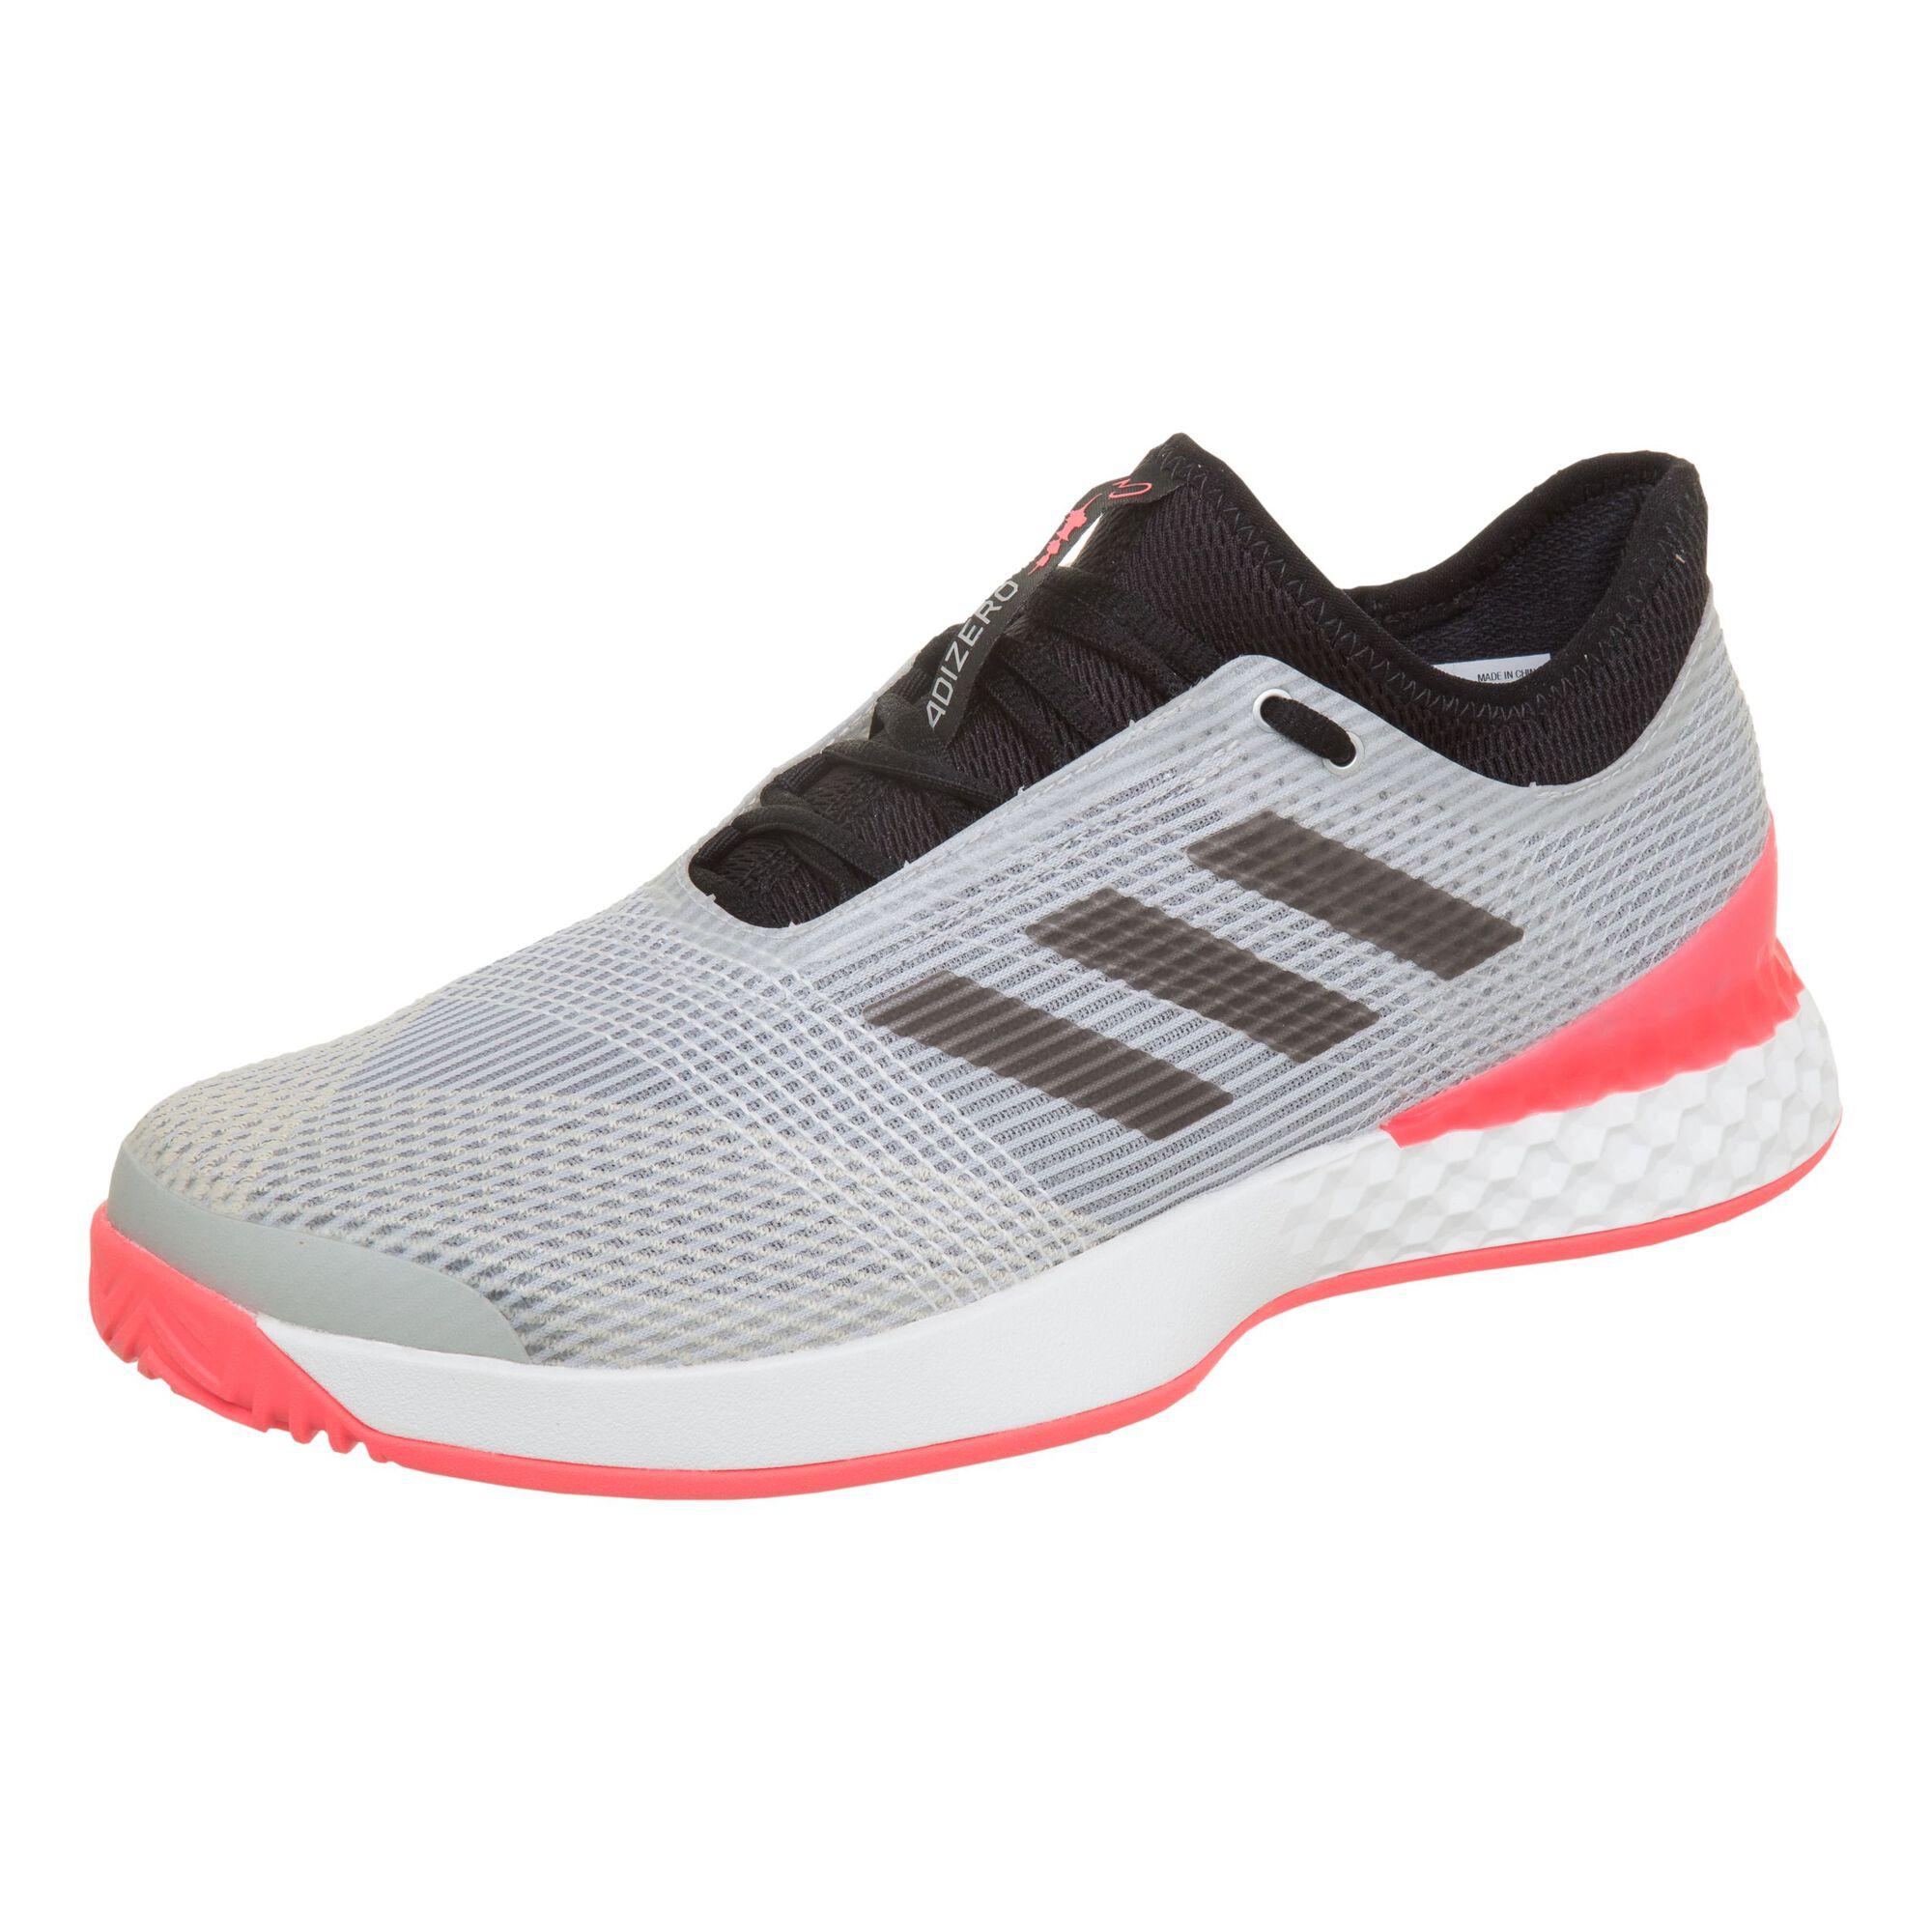 sports shoes 71a8c 08b18 Adizero Ubersonic 3 Men Adizero Ubersonic 3 Men ...